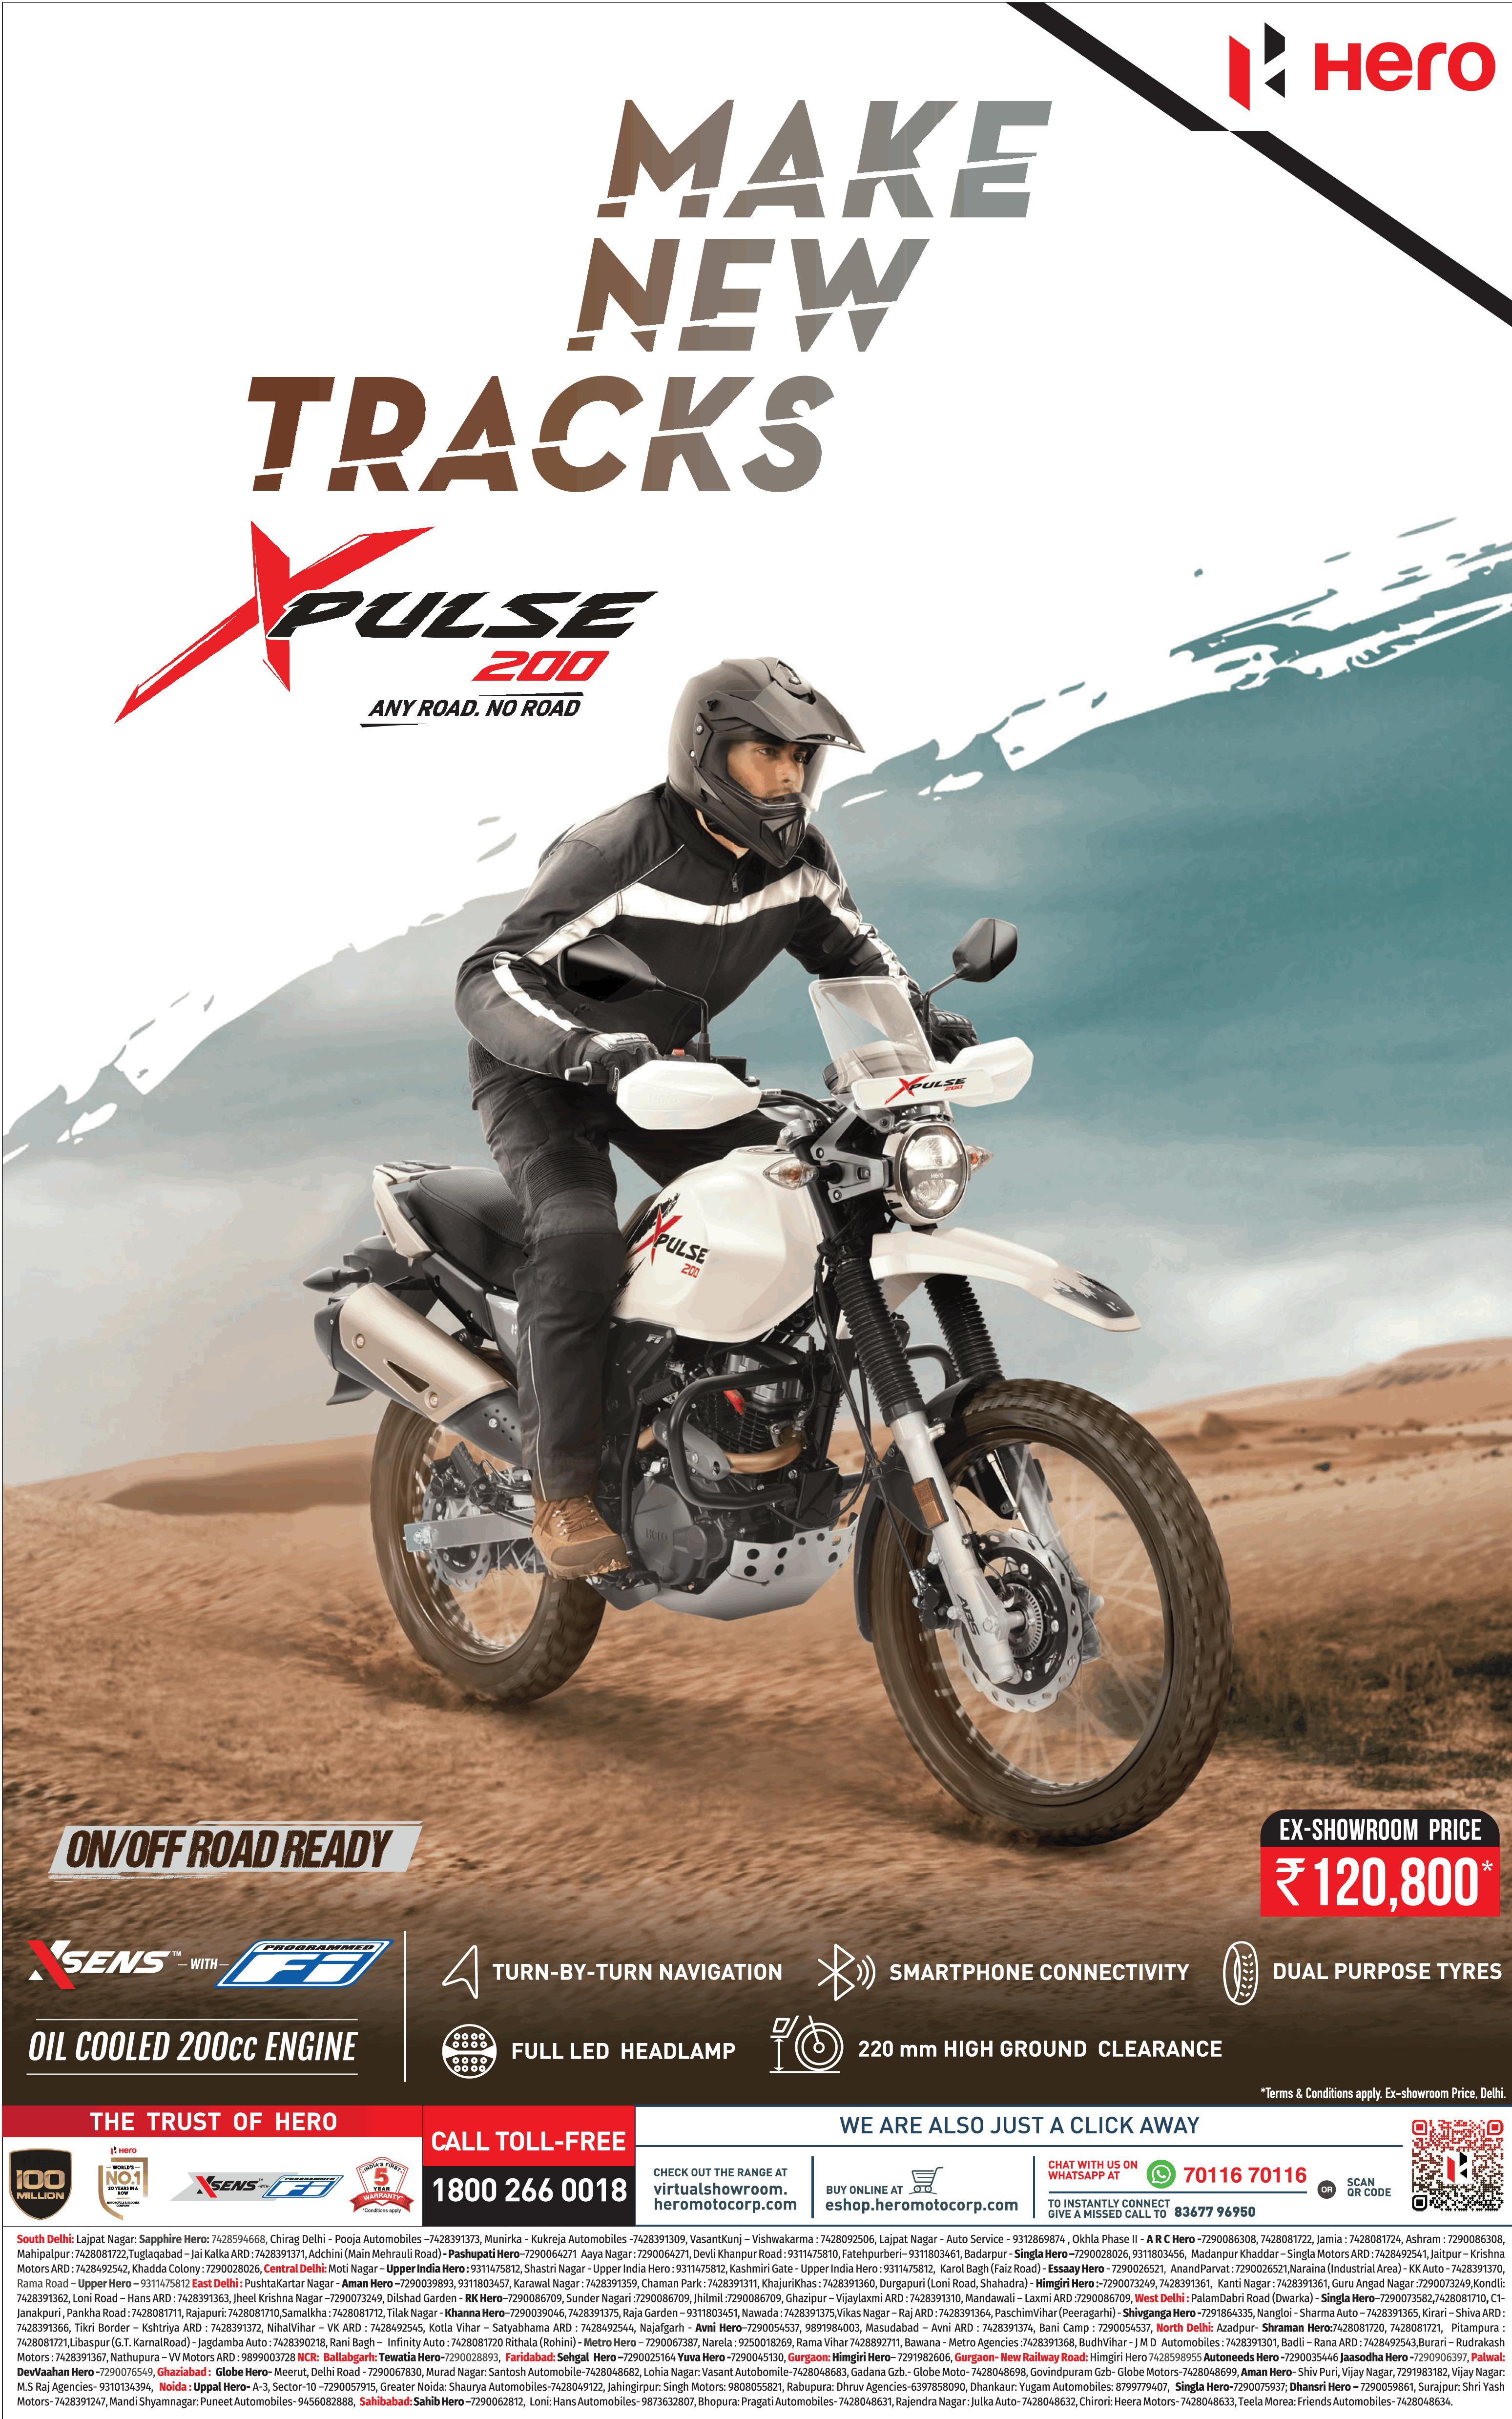 hero-pulse-200-ex-showroom-price-rs-120800-make-new-tracks-ad-toi-delhi-11-7-2021